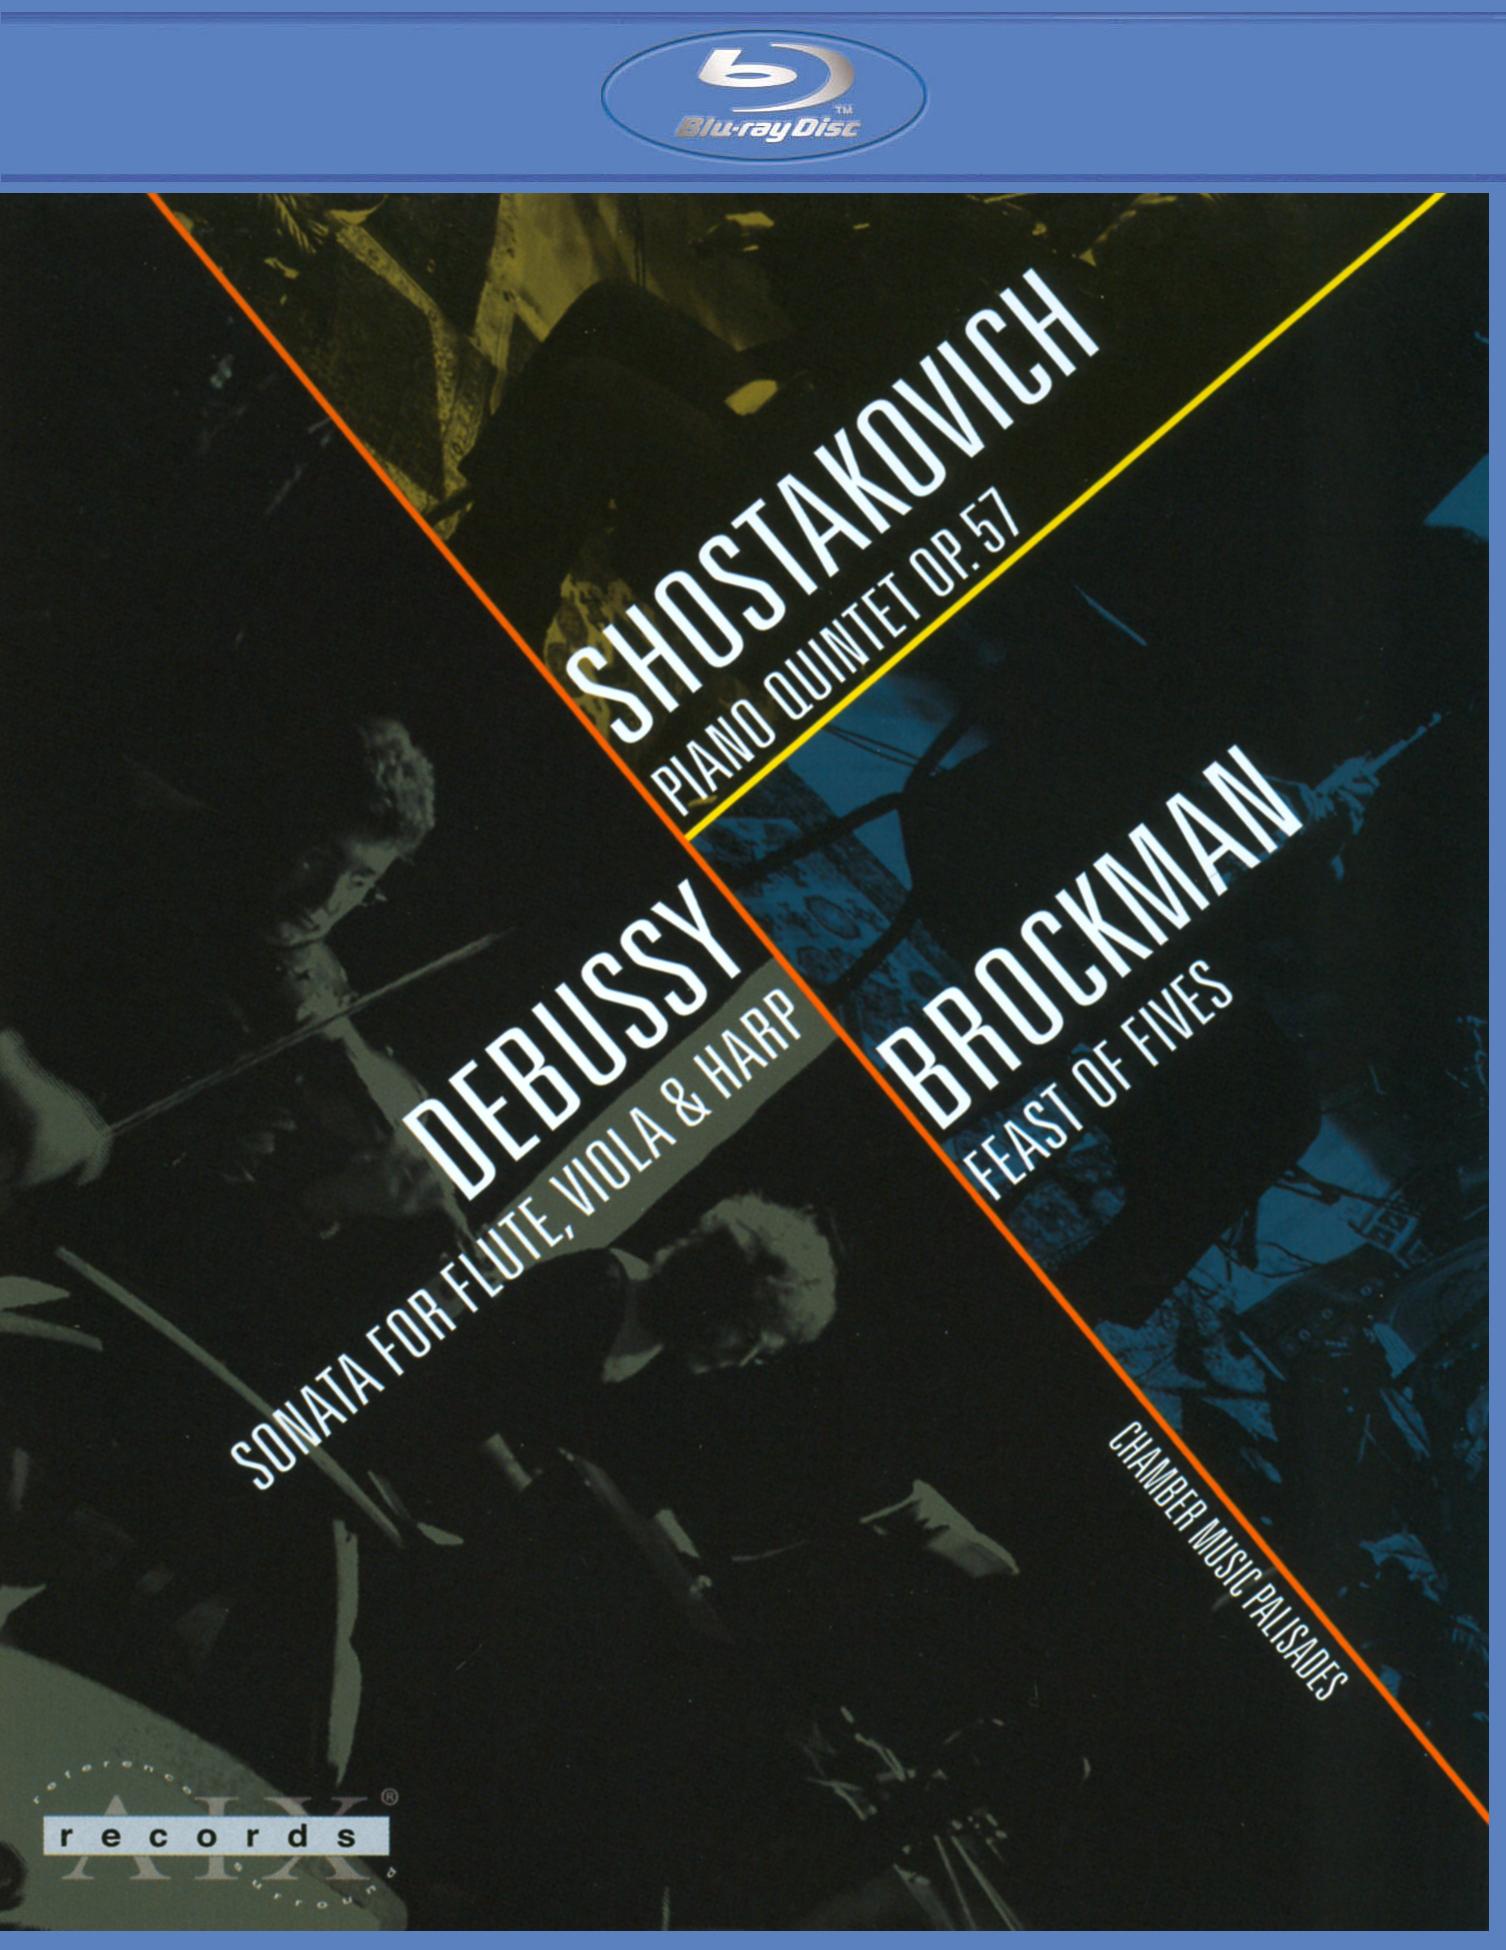 Chamber Music Palisades: Shostakovich/Debussy/Brockman